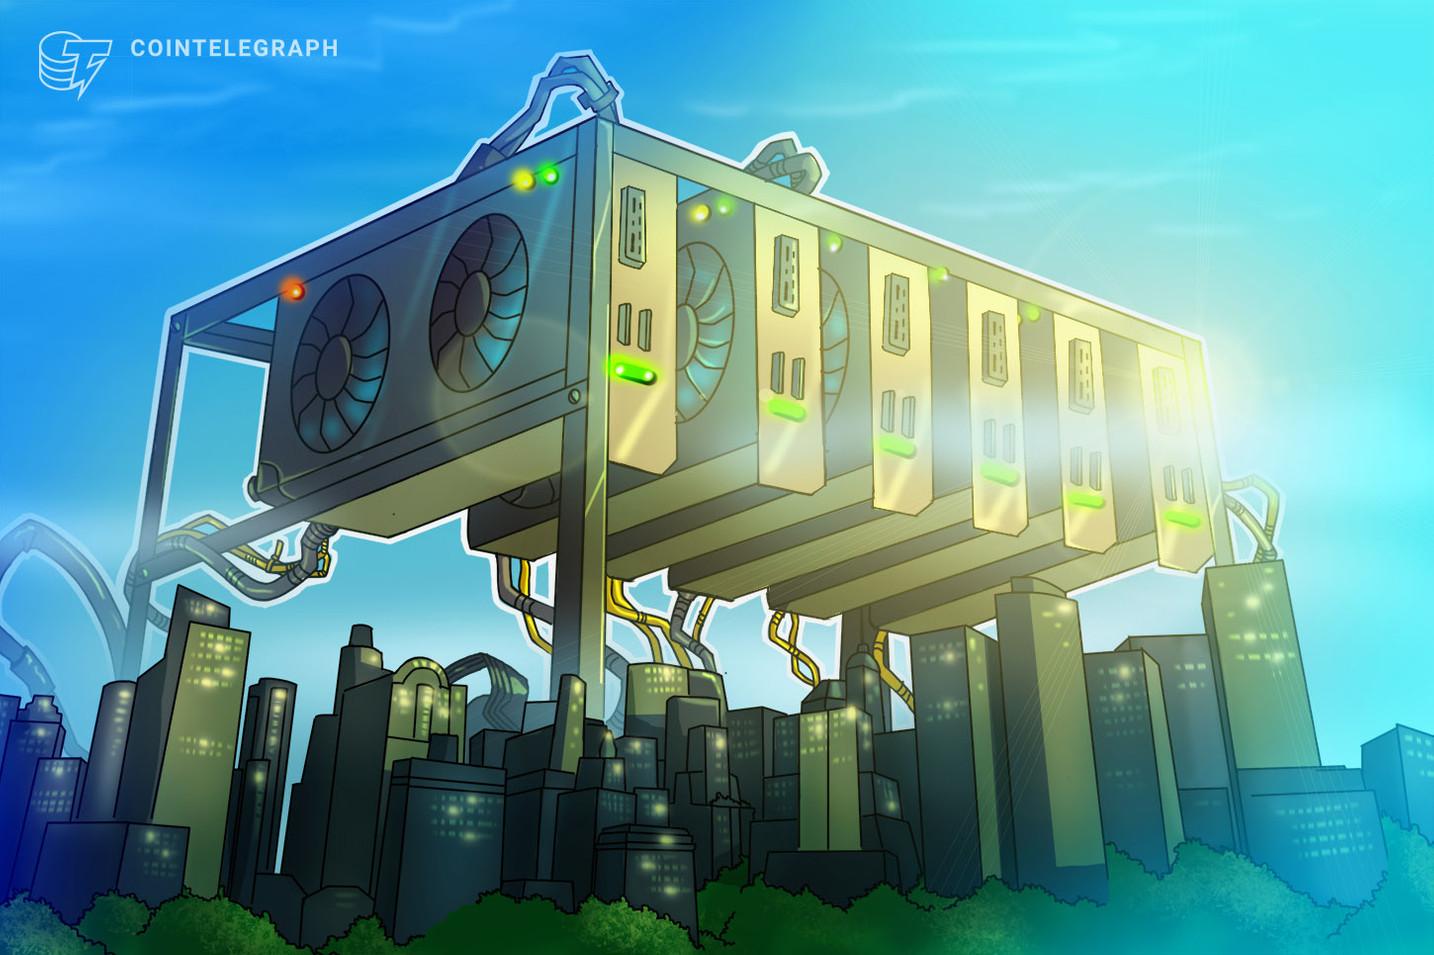 Nvidia supply shortage won't stop $50M Q1 crypto miner sales, says CFO